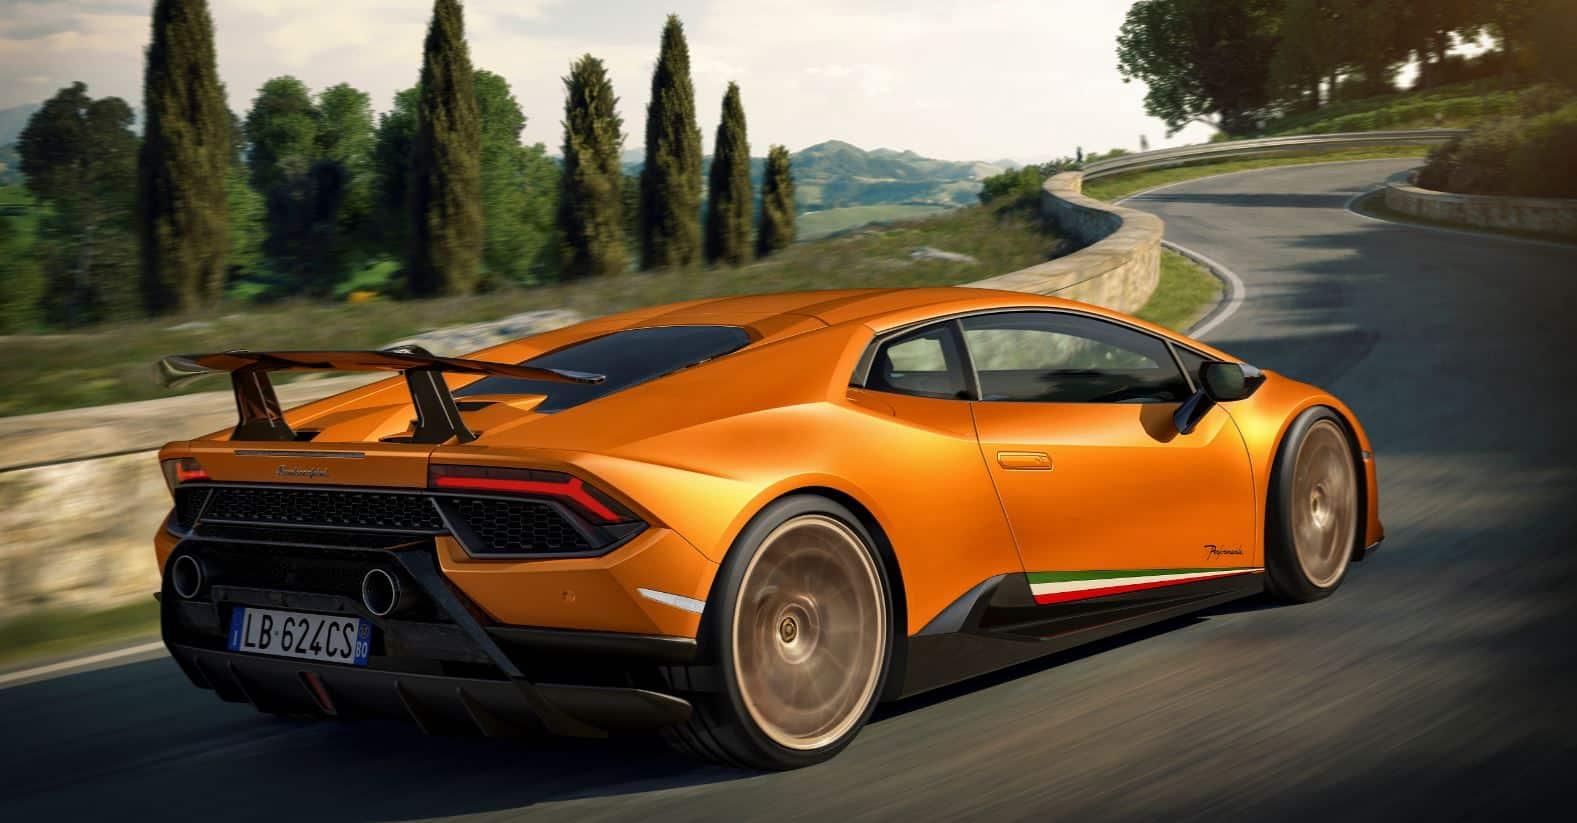 Lamborghini Huracán Performante 5